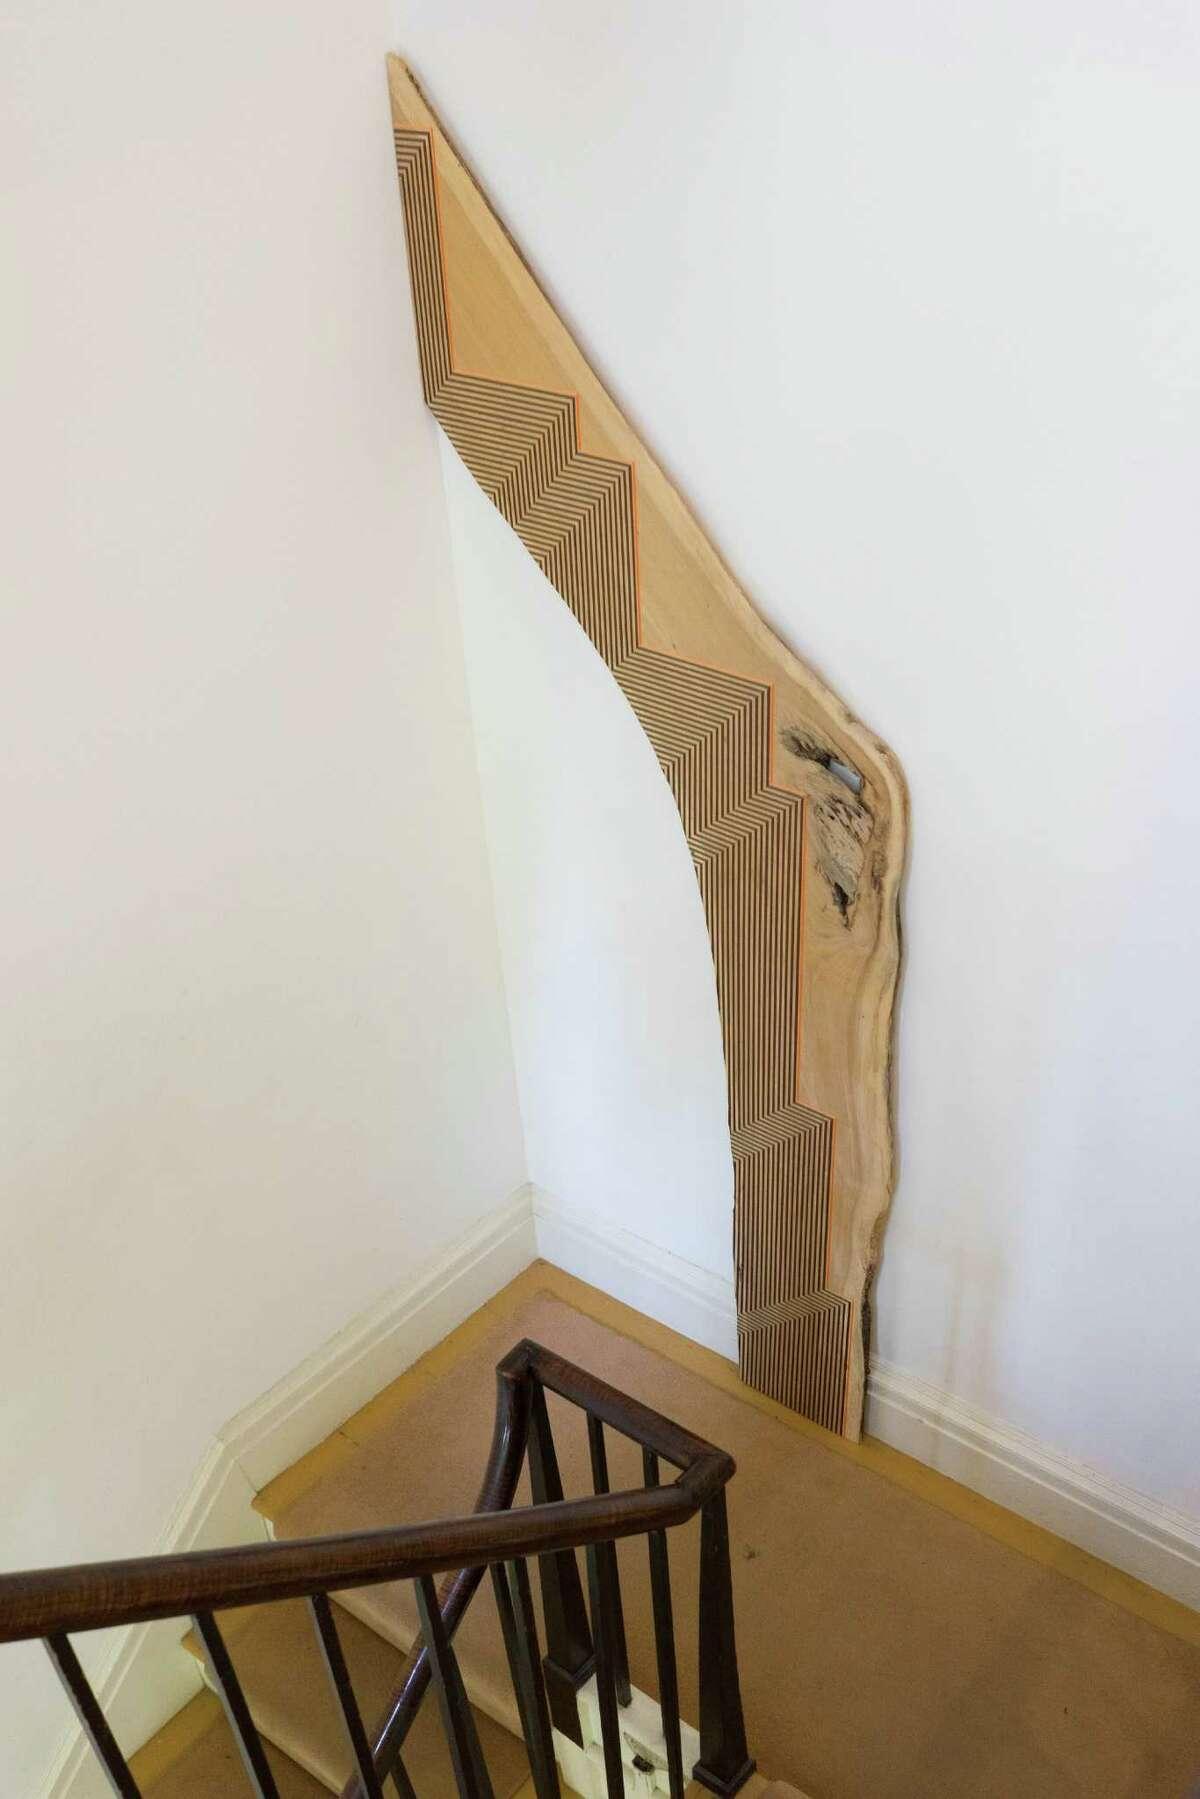 Middlebrook, Corner Steps, 2012, acrylic on maple, detail